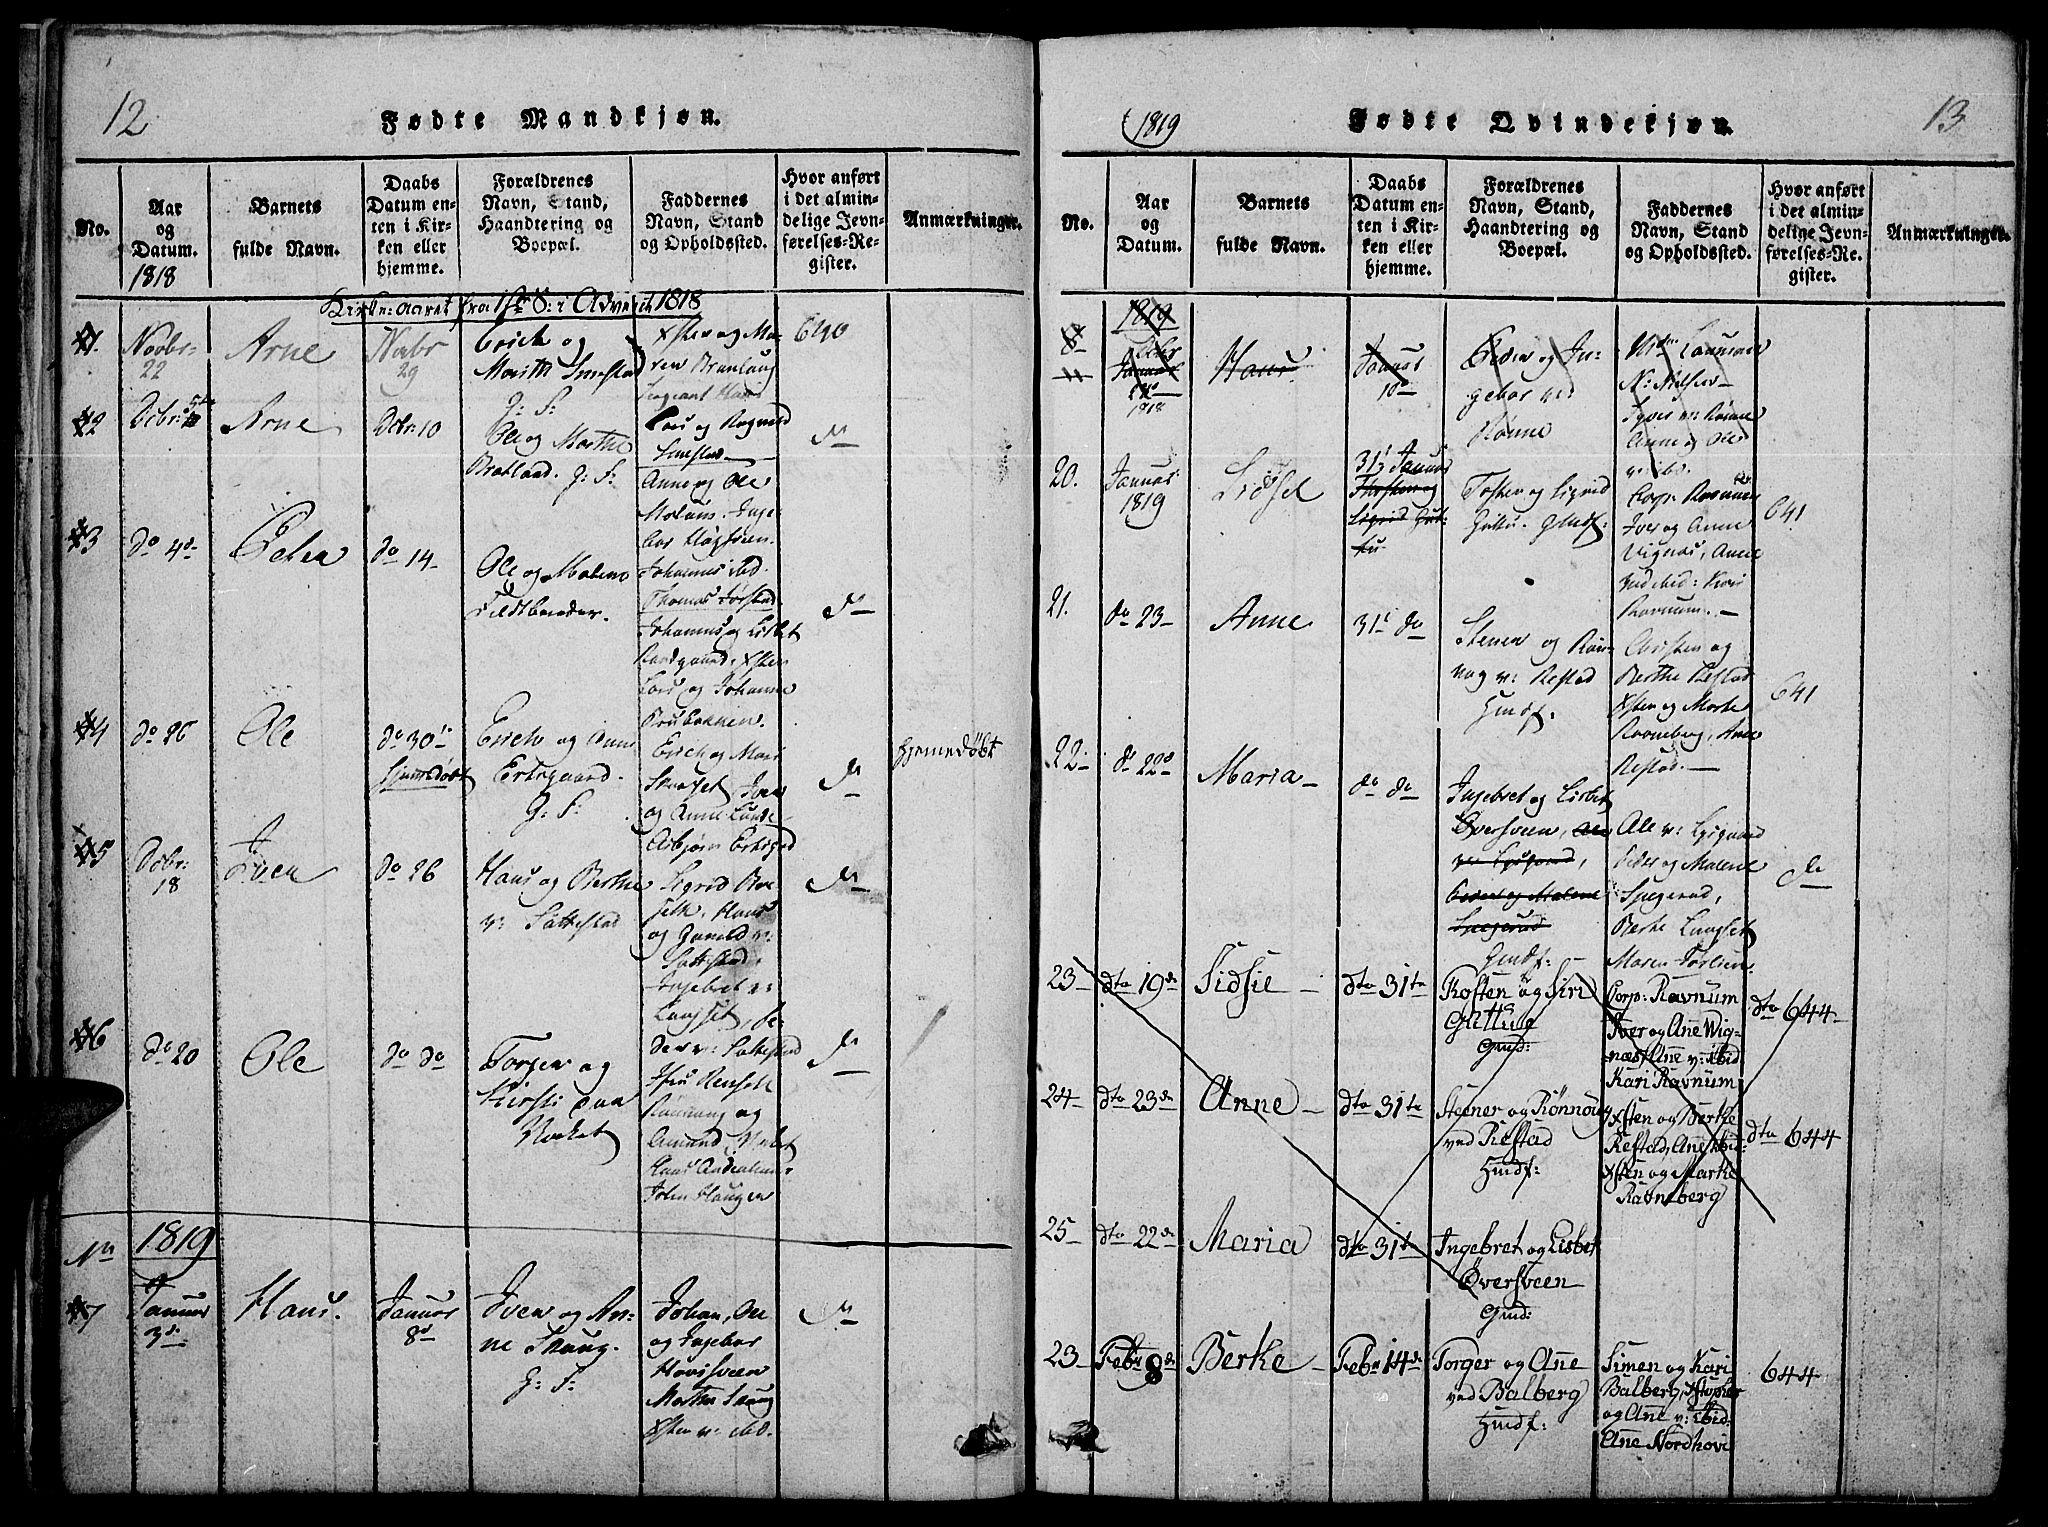 SAH, Fåberg prestekontor, Ministerialbok nr. 3, 1818-1833, s. 12-13